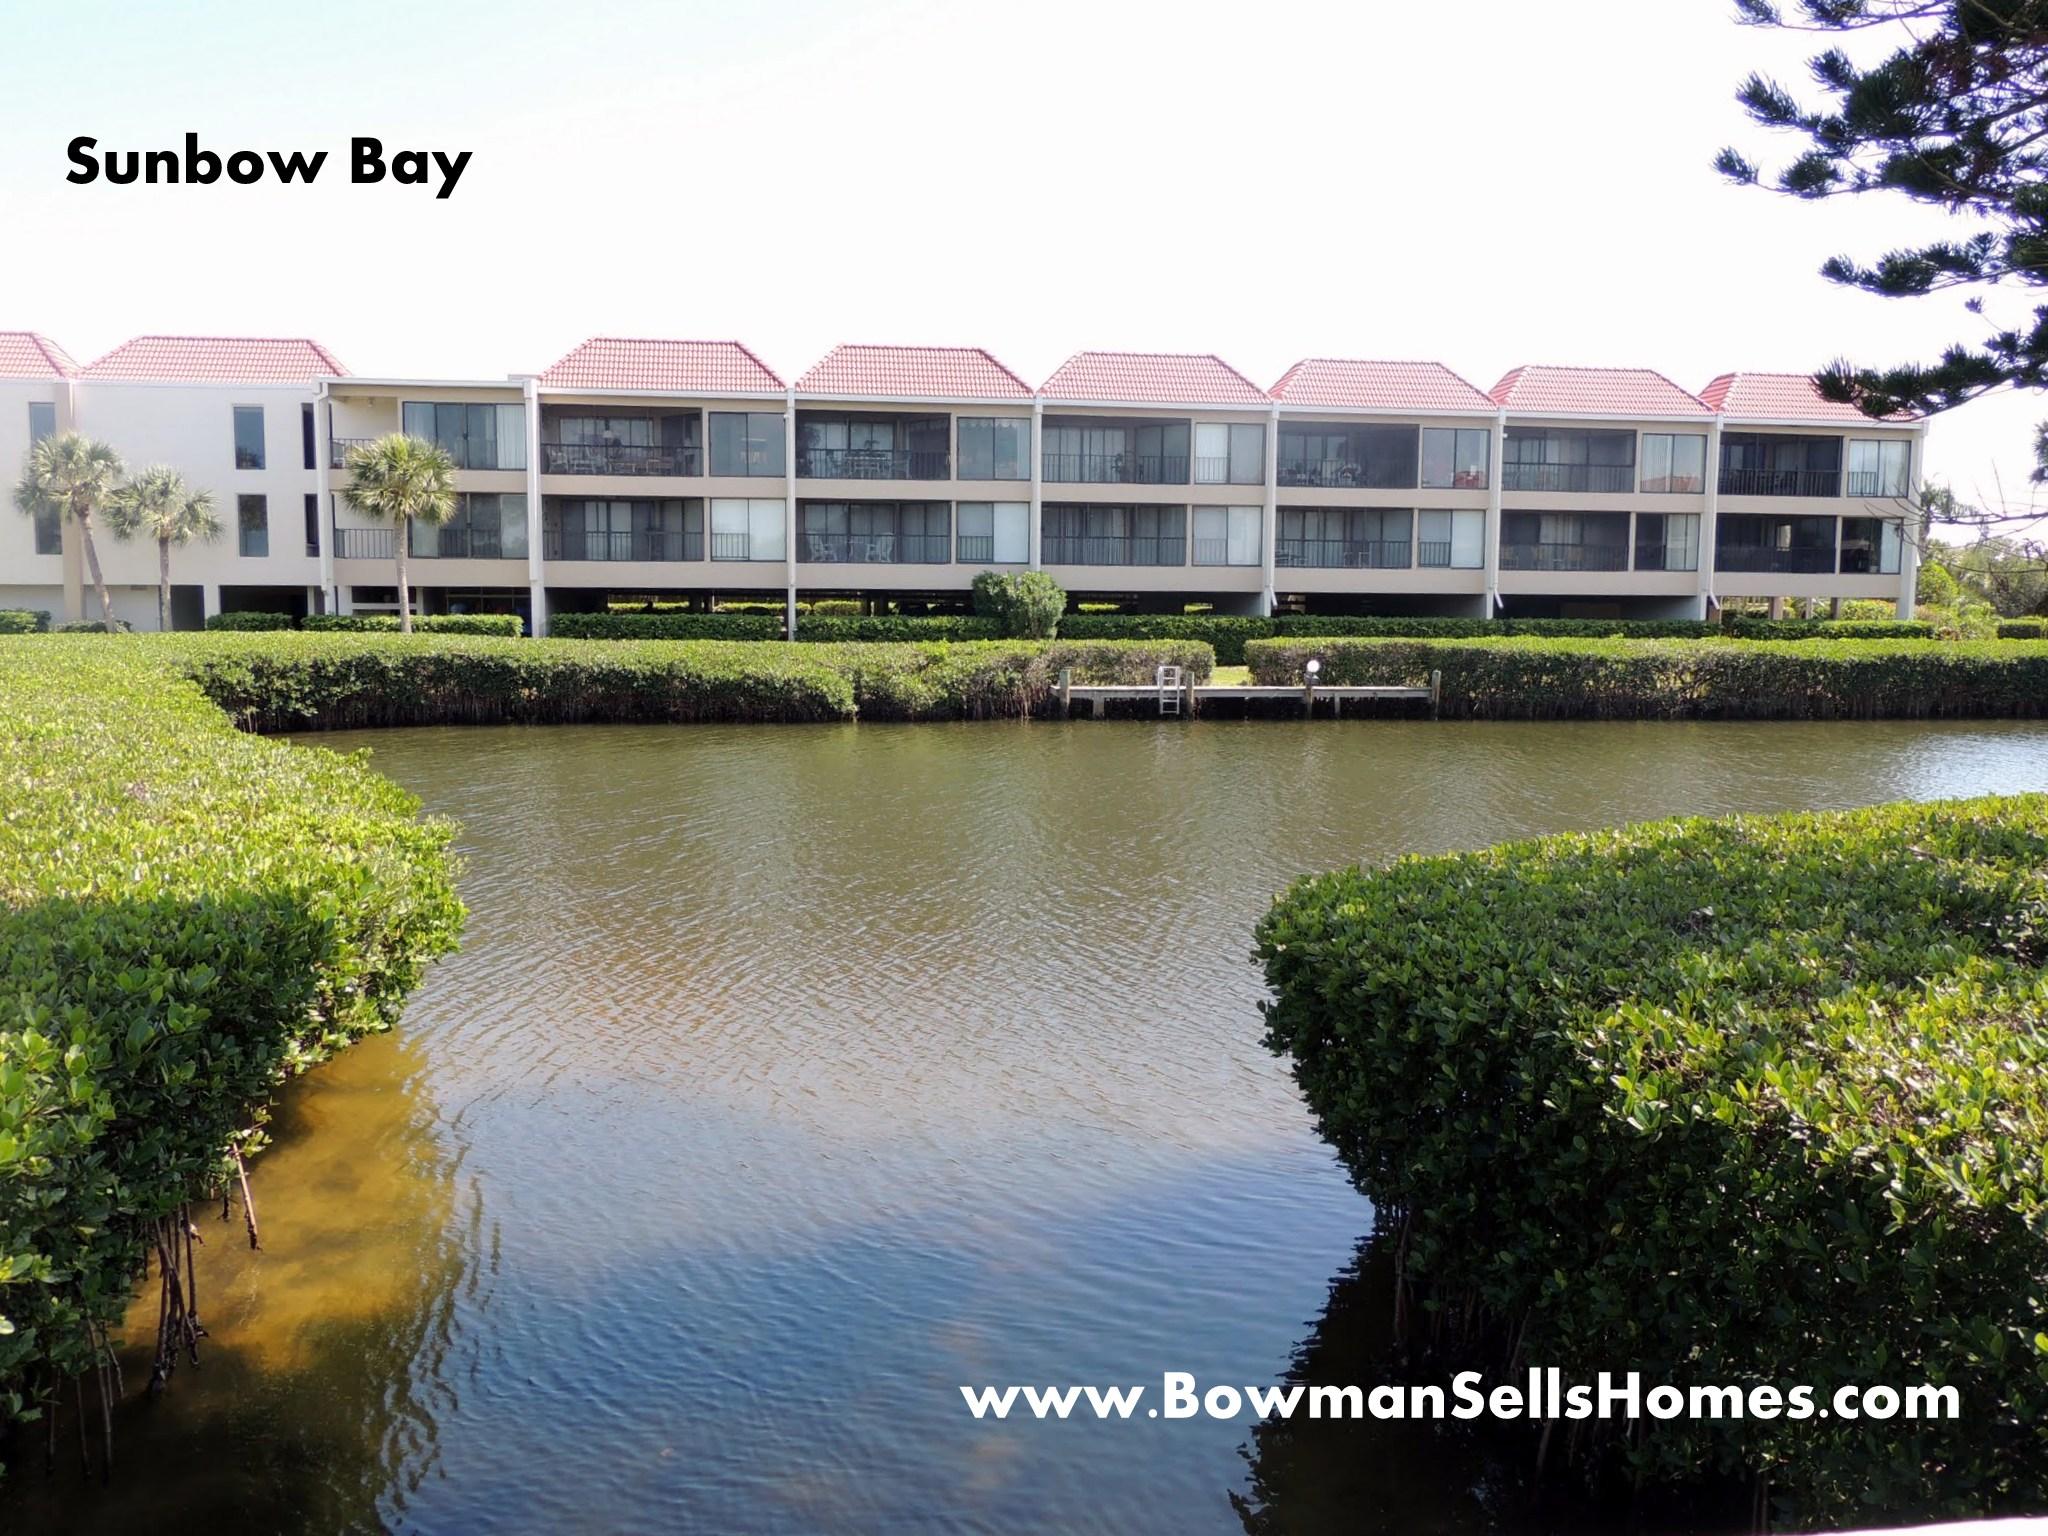 Sunbow Bay